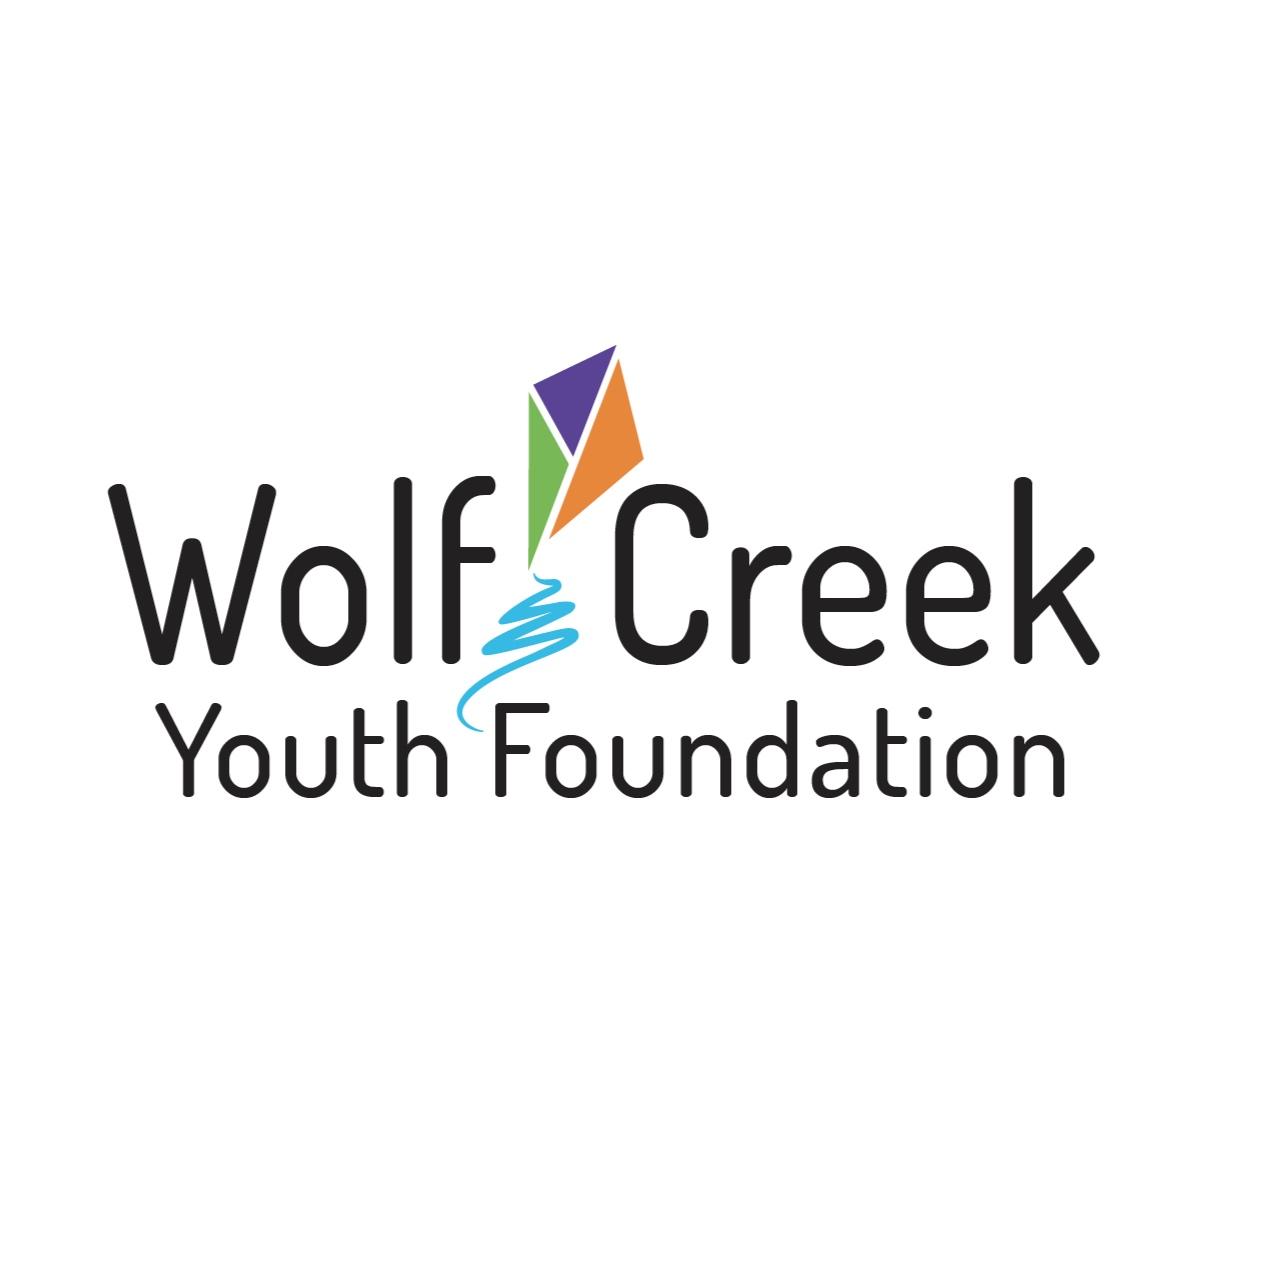 Wolf Creek Youth Foundation